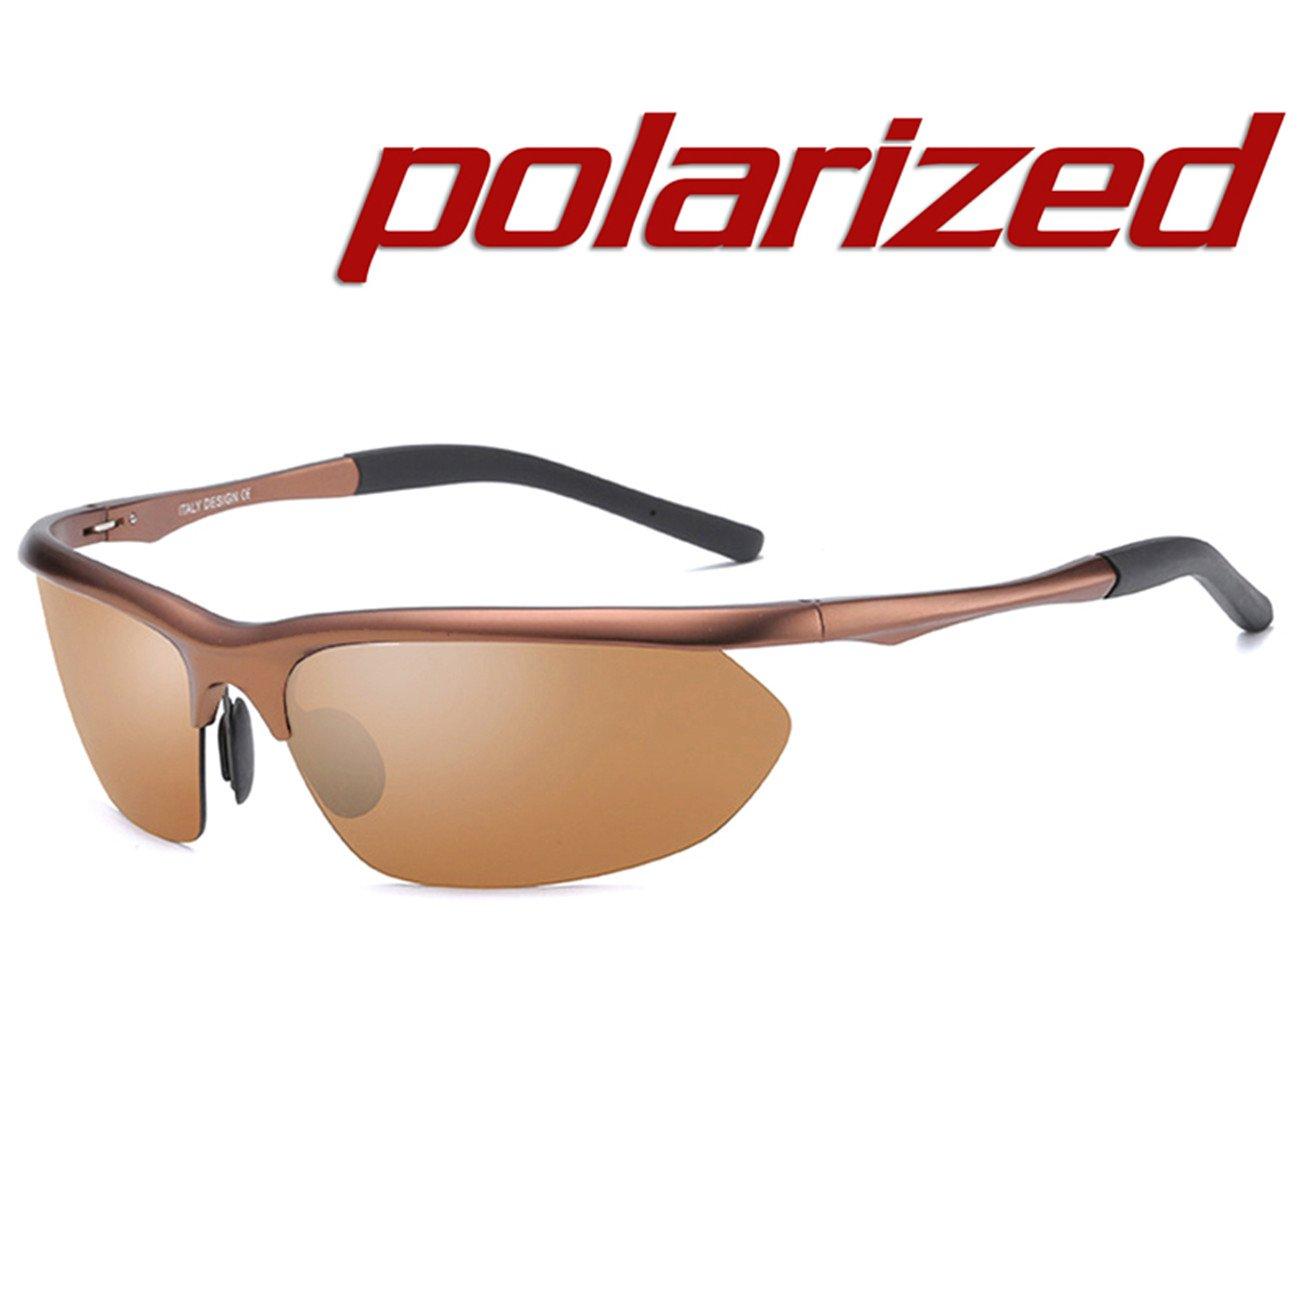 JULI Polarisiert Sport Sonnenbrillen Herren Damen Aluminium Magnesium Legierung Unzerbrechlich Rahmen 8124-004-A